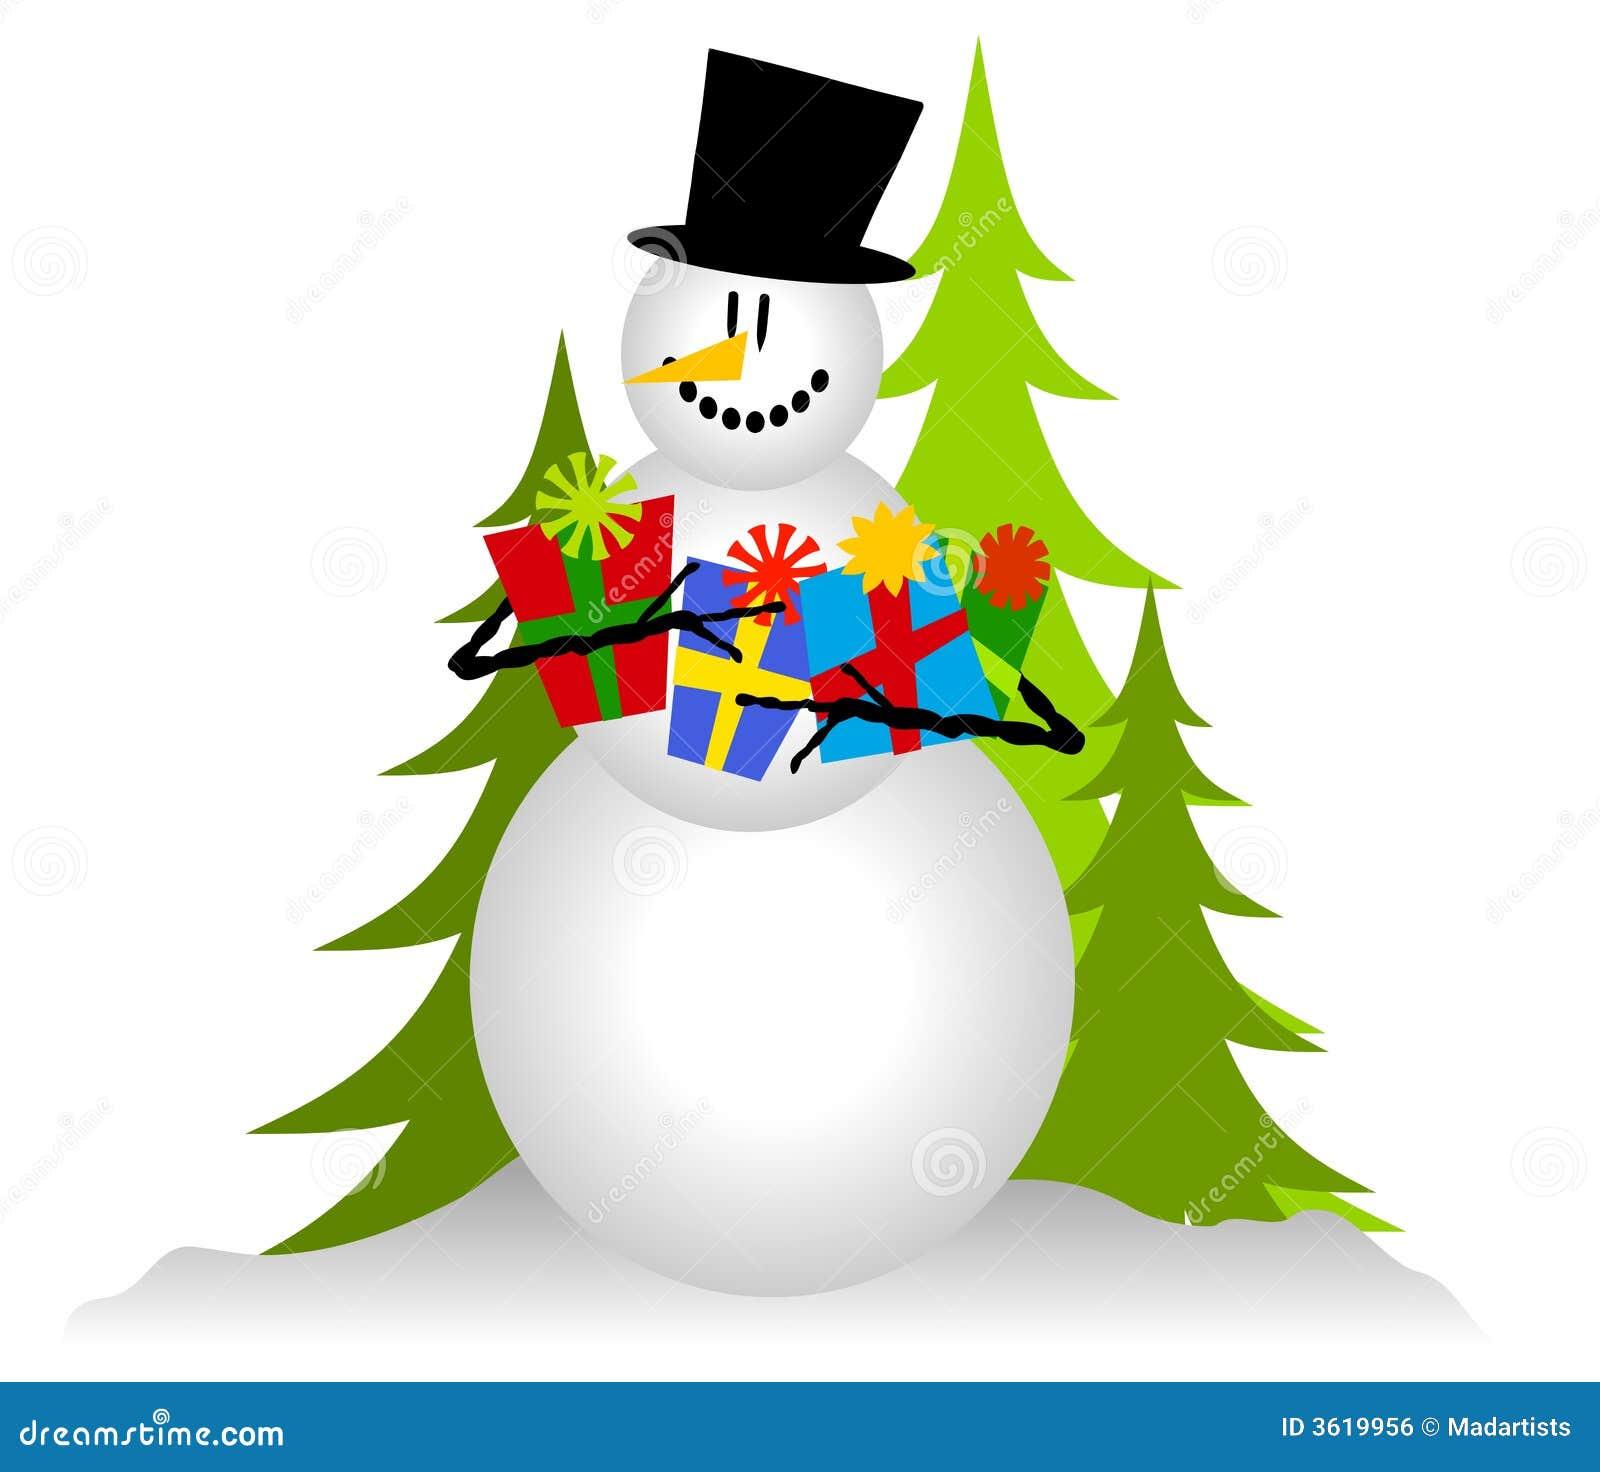 Snowman Holding Christmas Gifts 2 Stock Illustration - Illustration ...